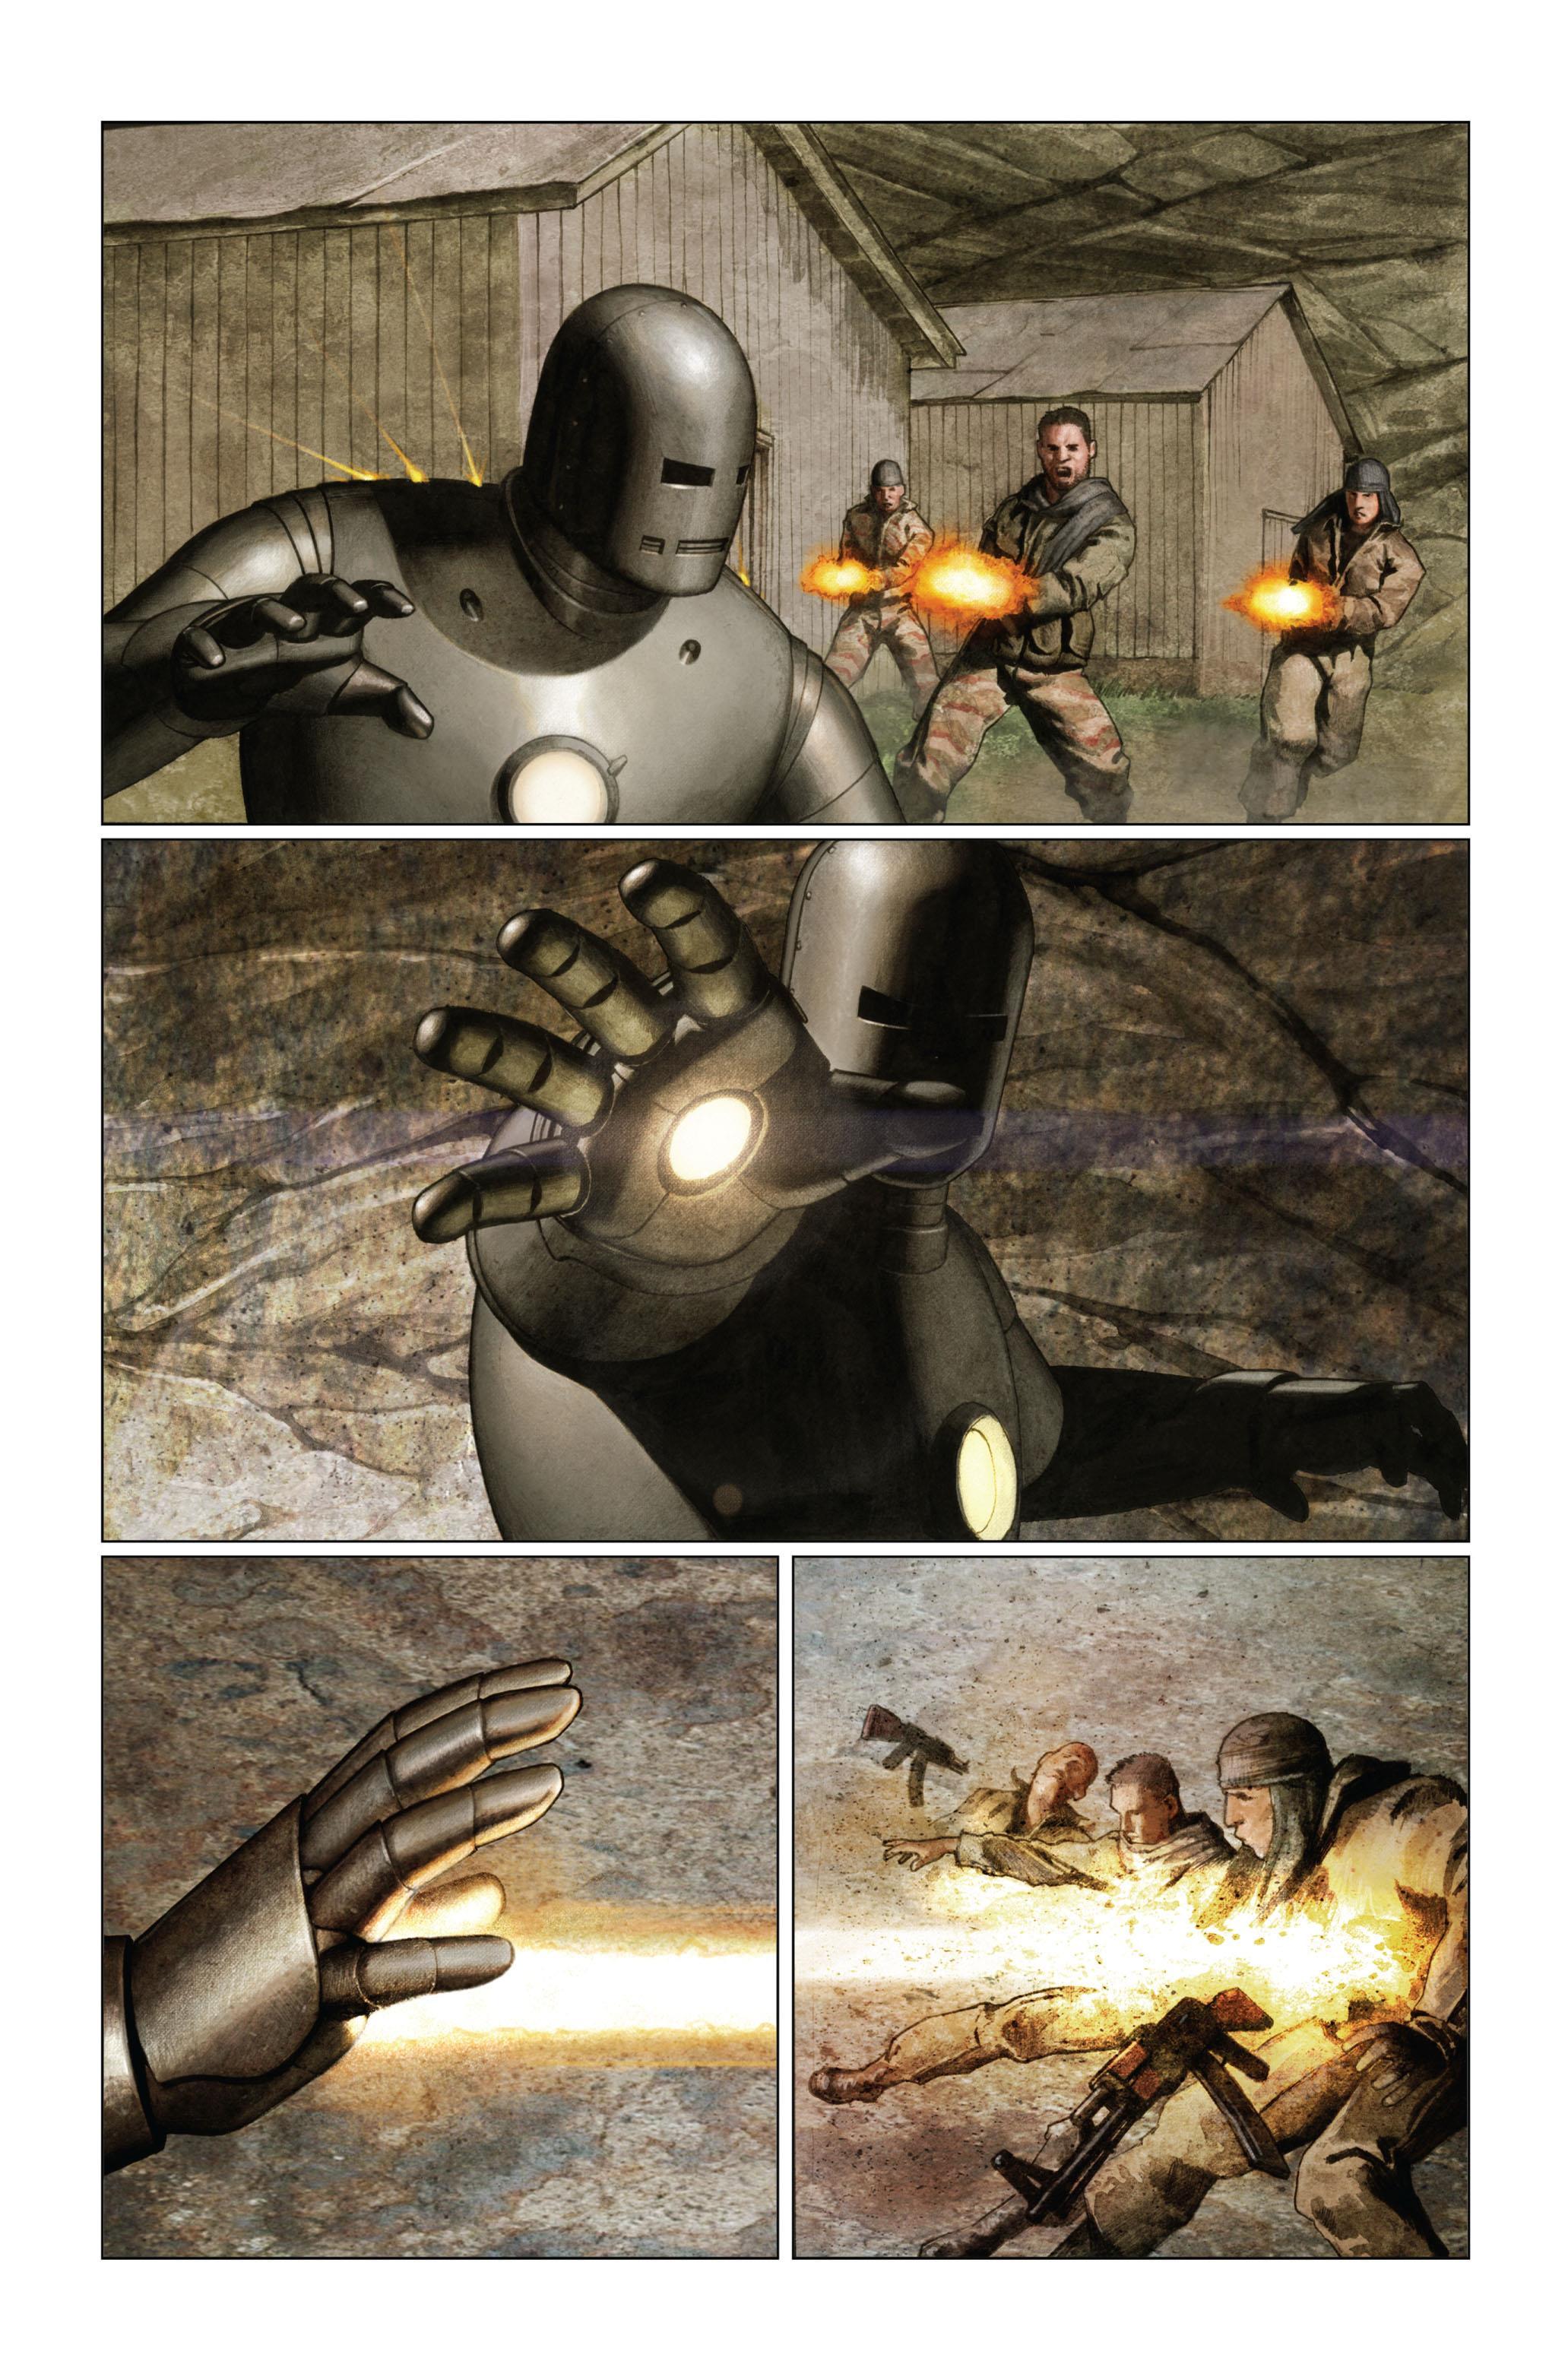 Iron Man Extremis review